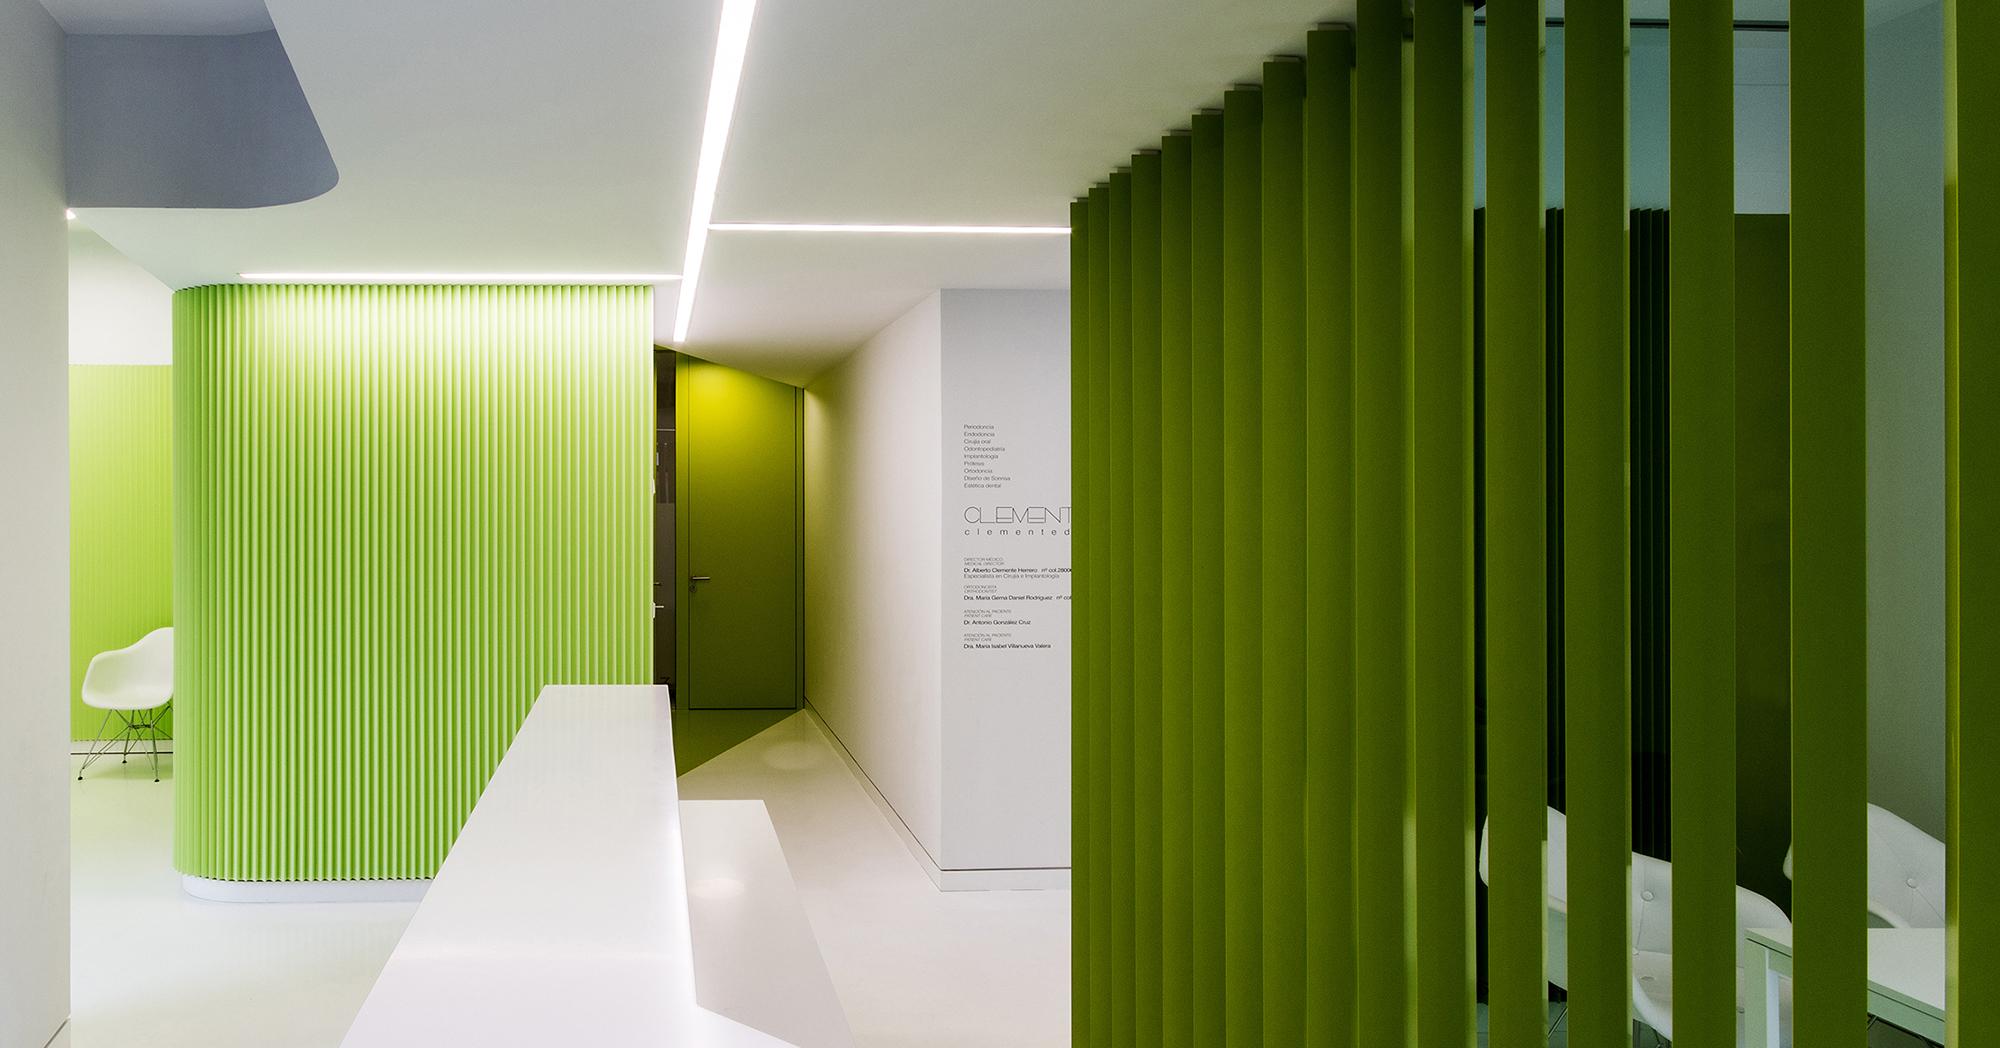 CLINICA CLEMENTE dental - LANDÍNEZ+REY arquitectos - arquitectura retail - escalera